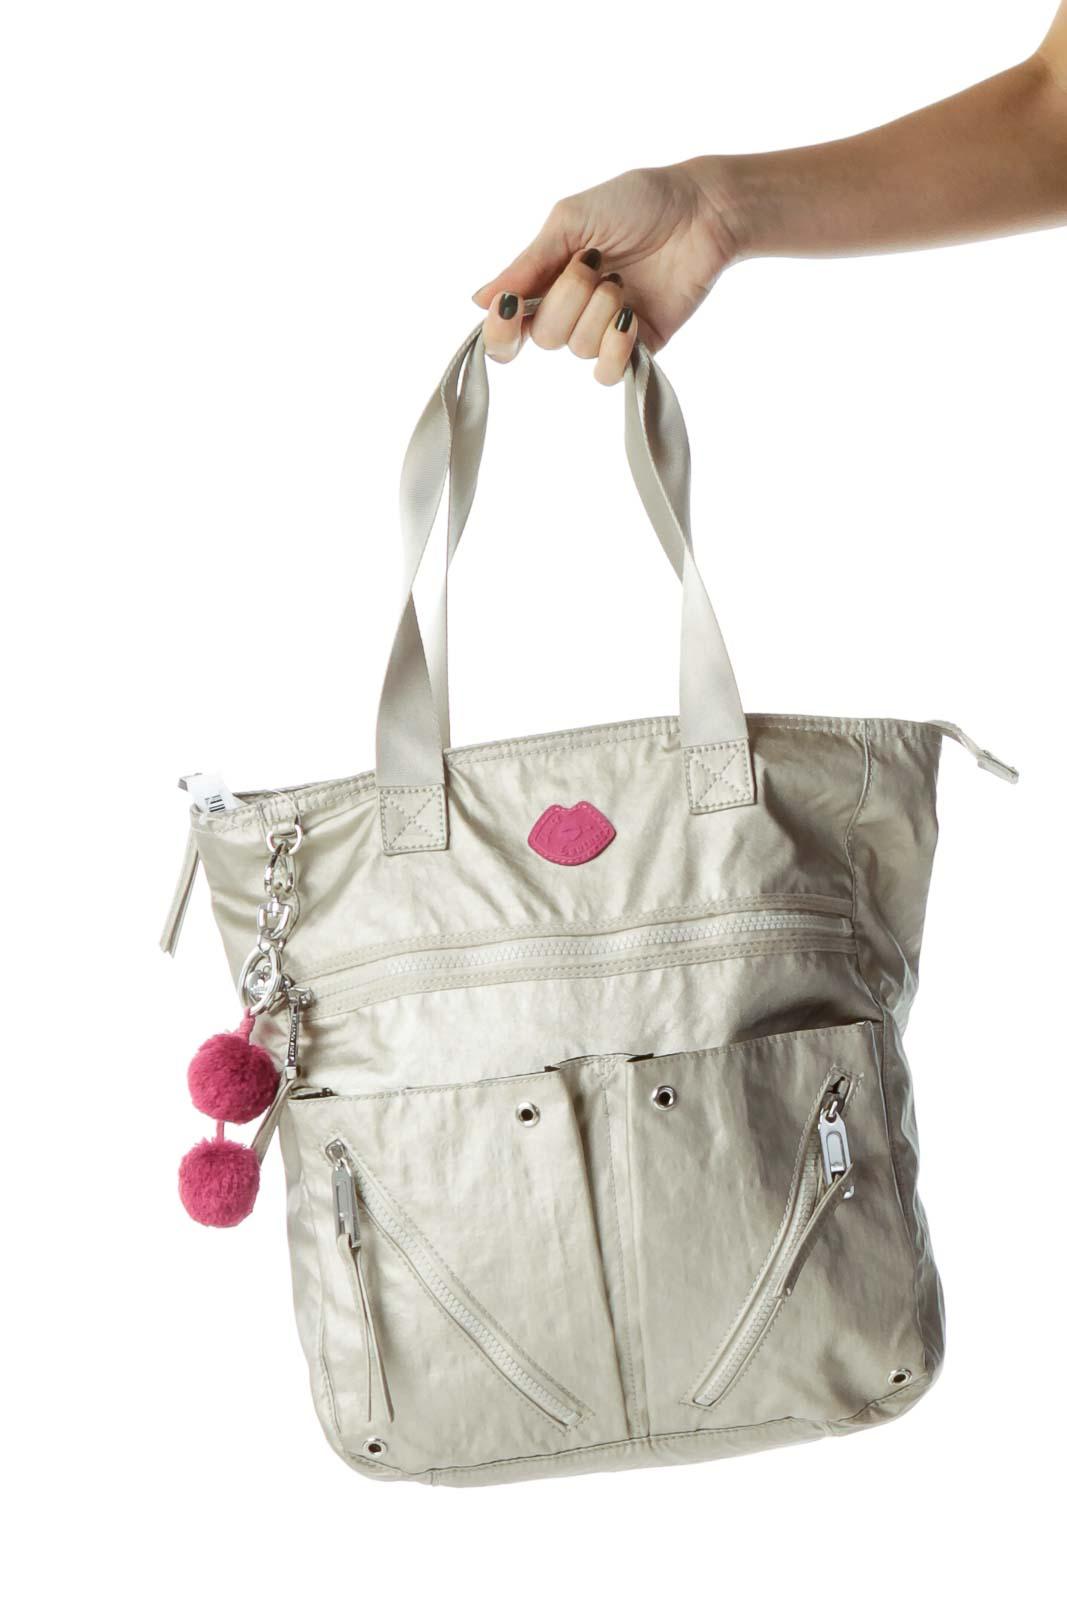 8302b996eea3 Shop Beige Metallic Zipper Detail Tote clothing and handbags at ...